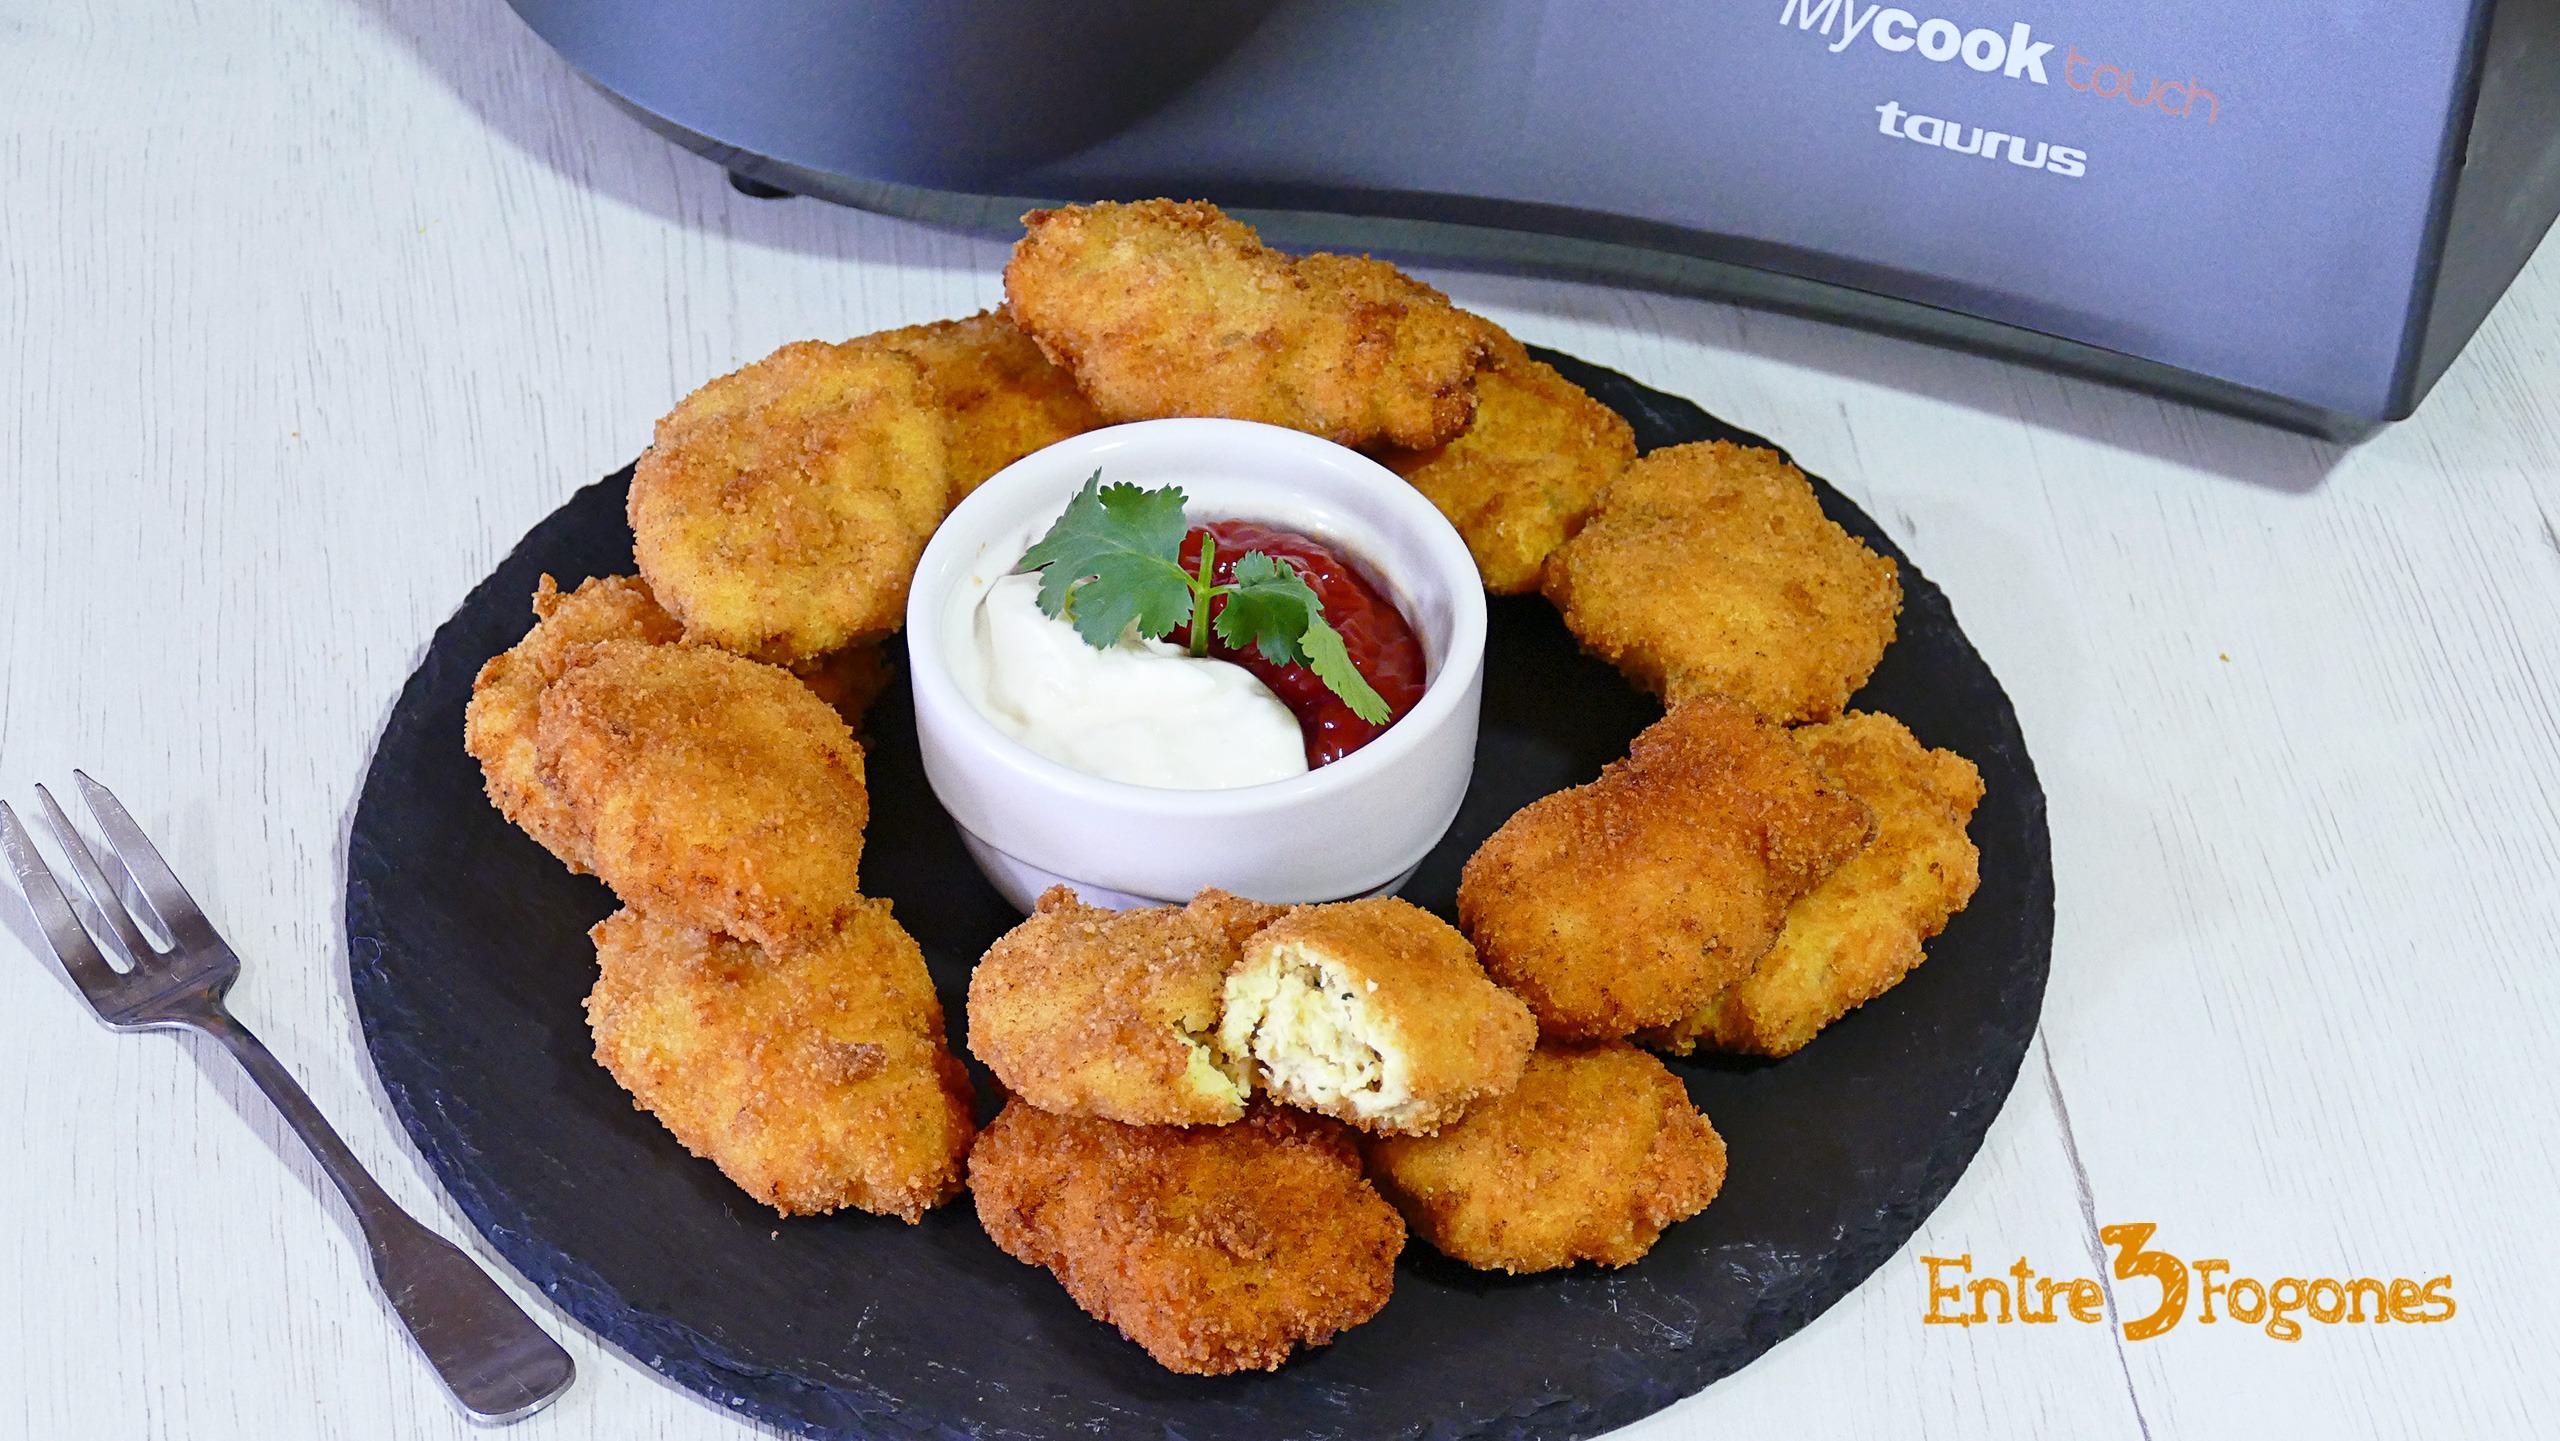 Nuggets de Pollo Caseros MyCook Touch